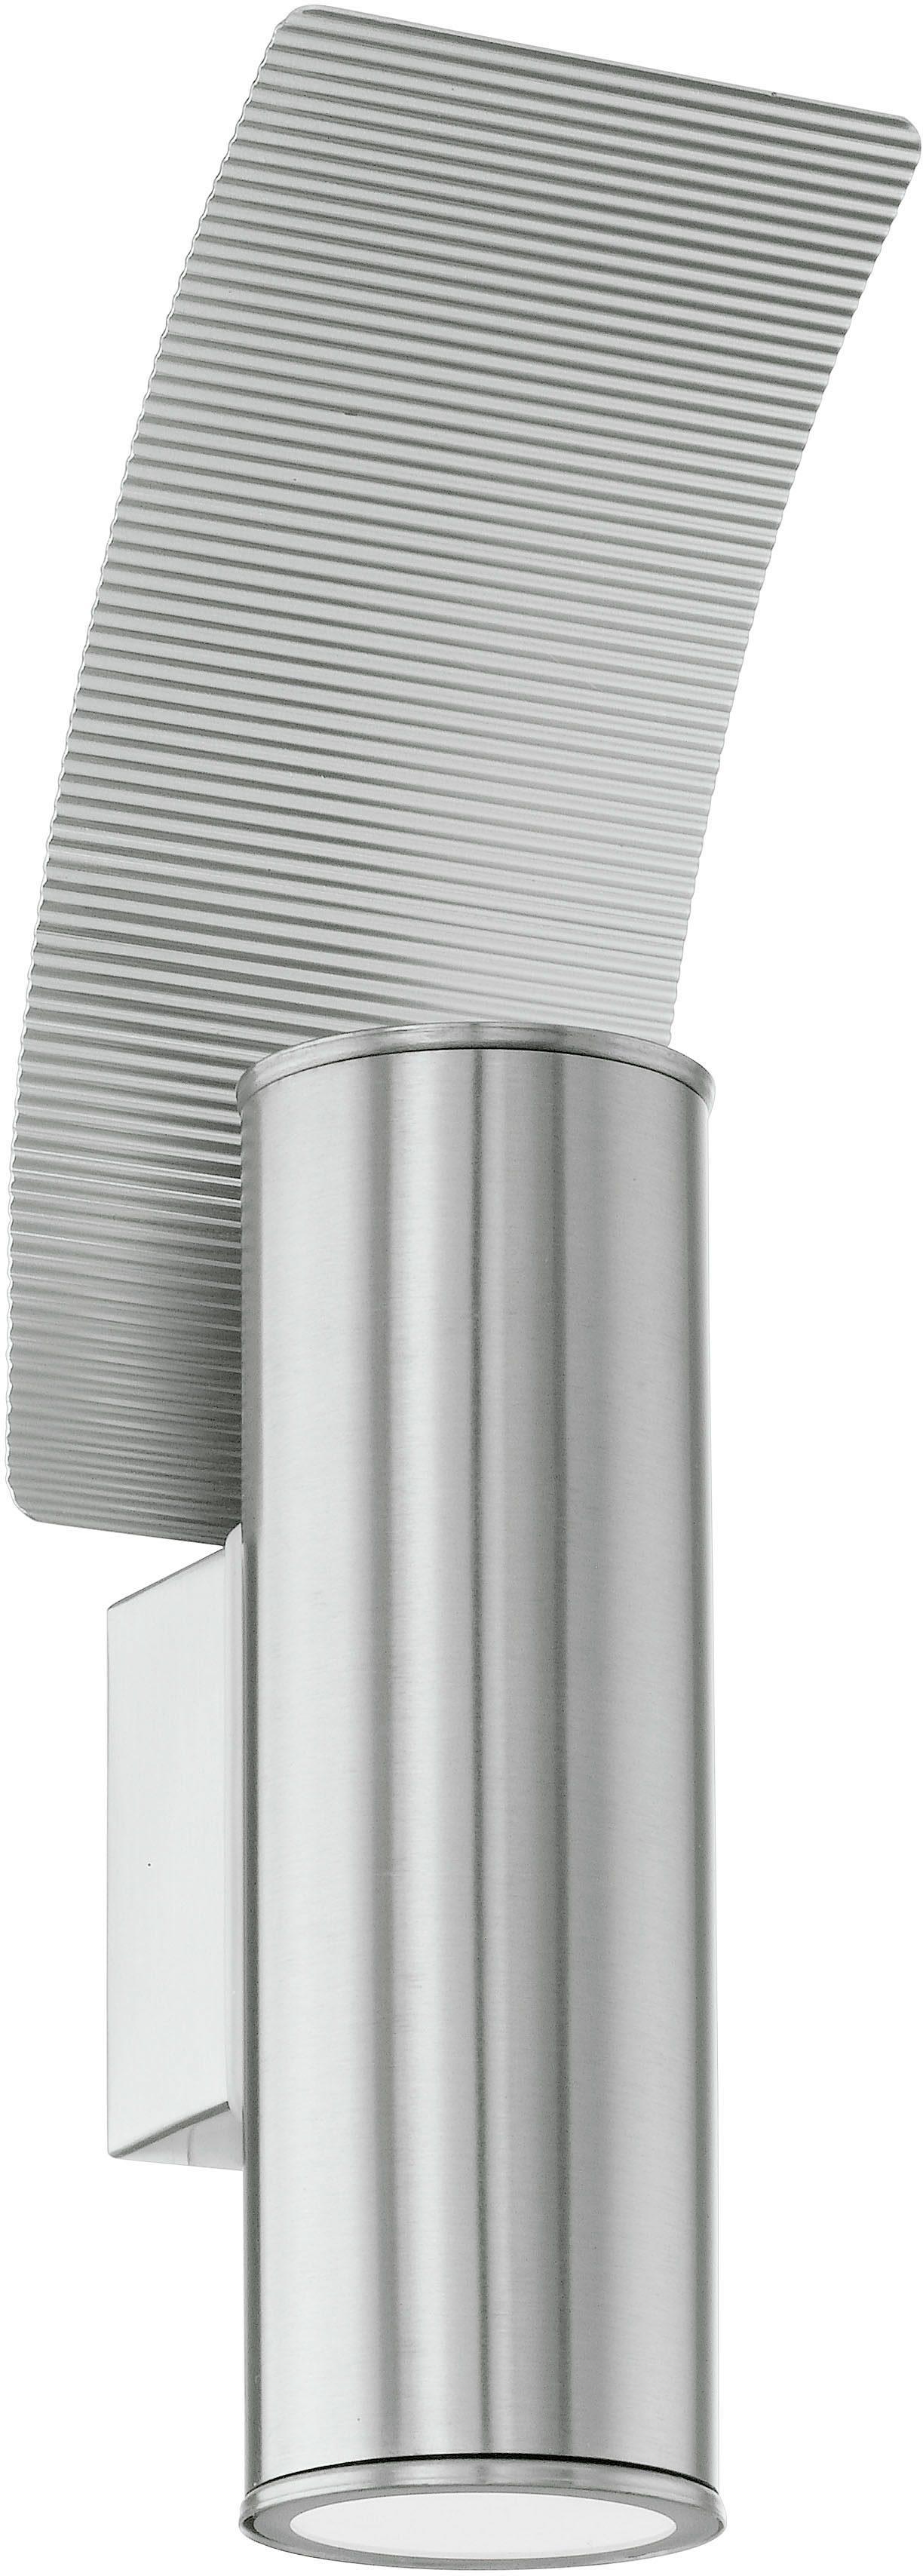 Eglo LED Außenleuchte, 2 flg., Wandleuchte, »Riga2«